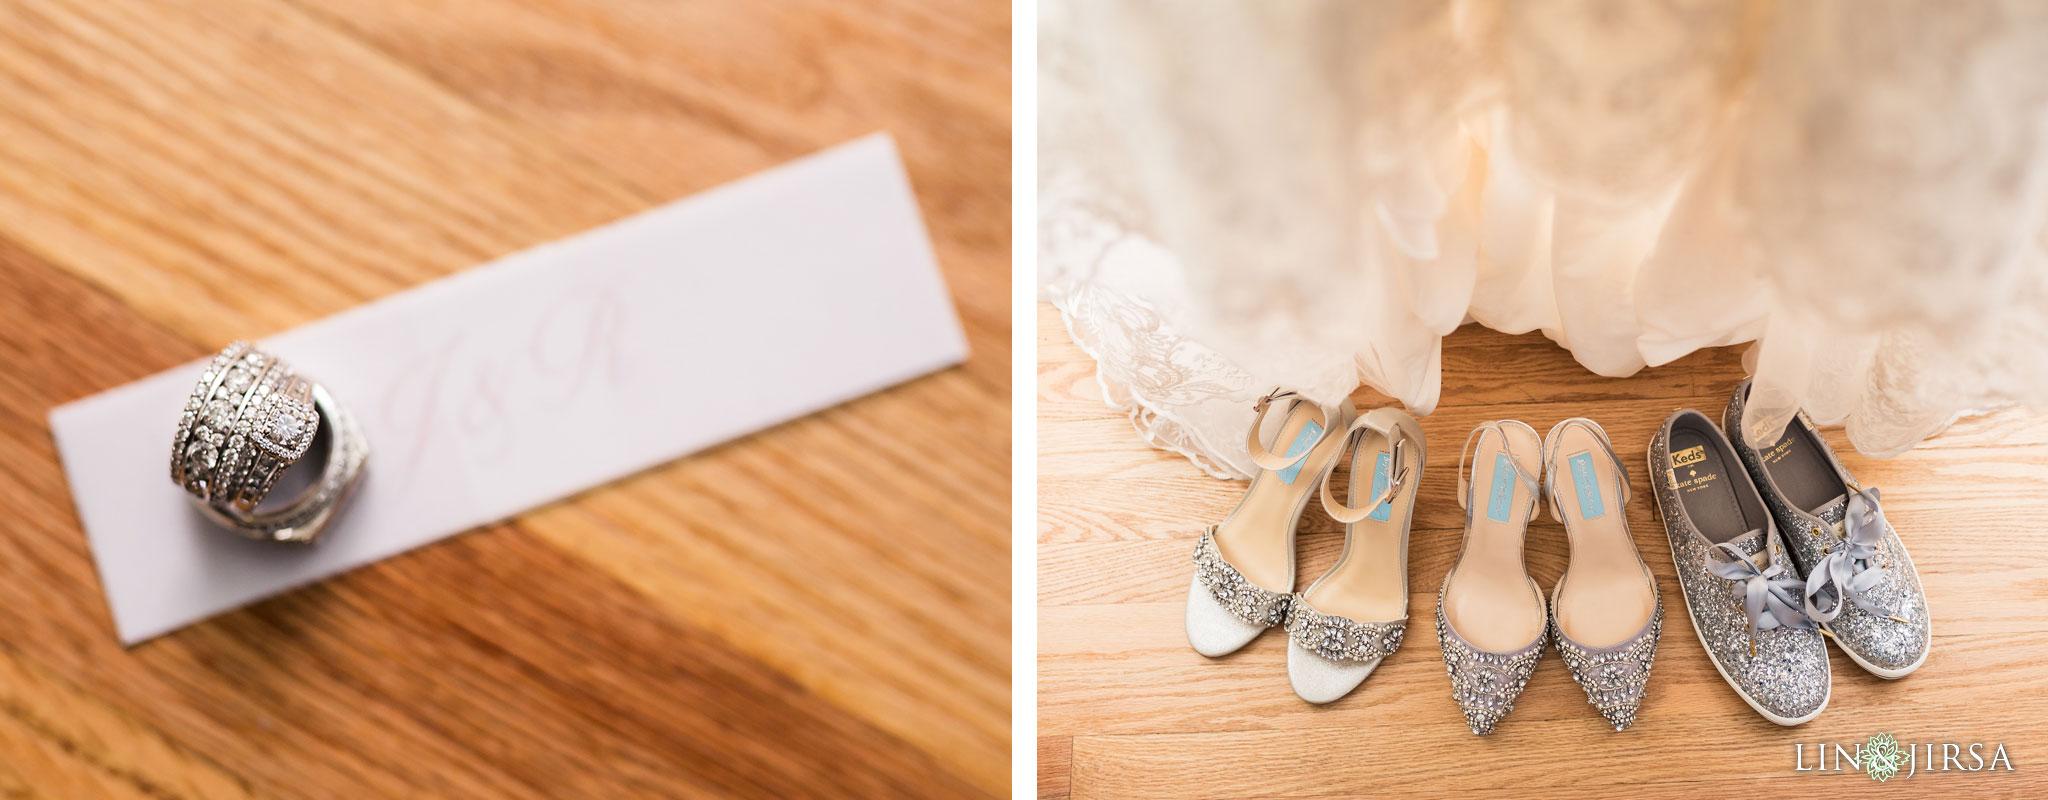 02 taglyan complex los angeles wedding photography